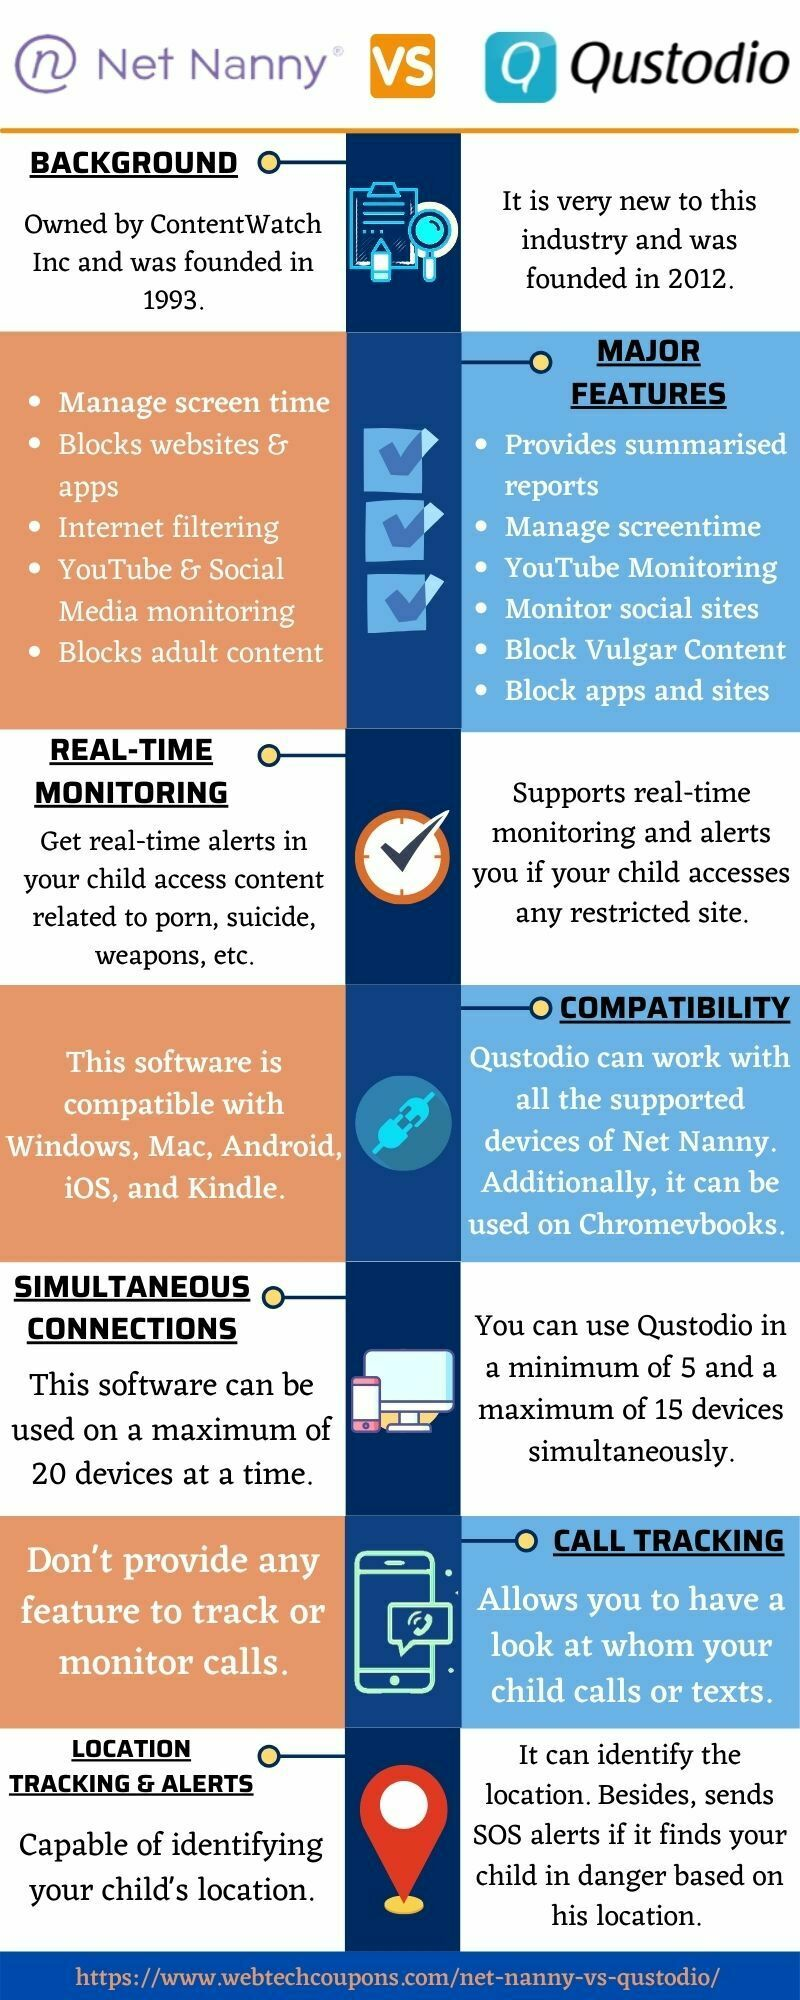 Qustodio vs Net Nanny www.webtechcoupons.com